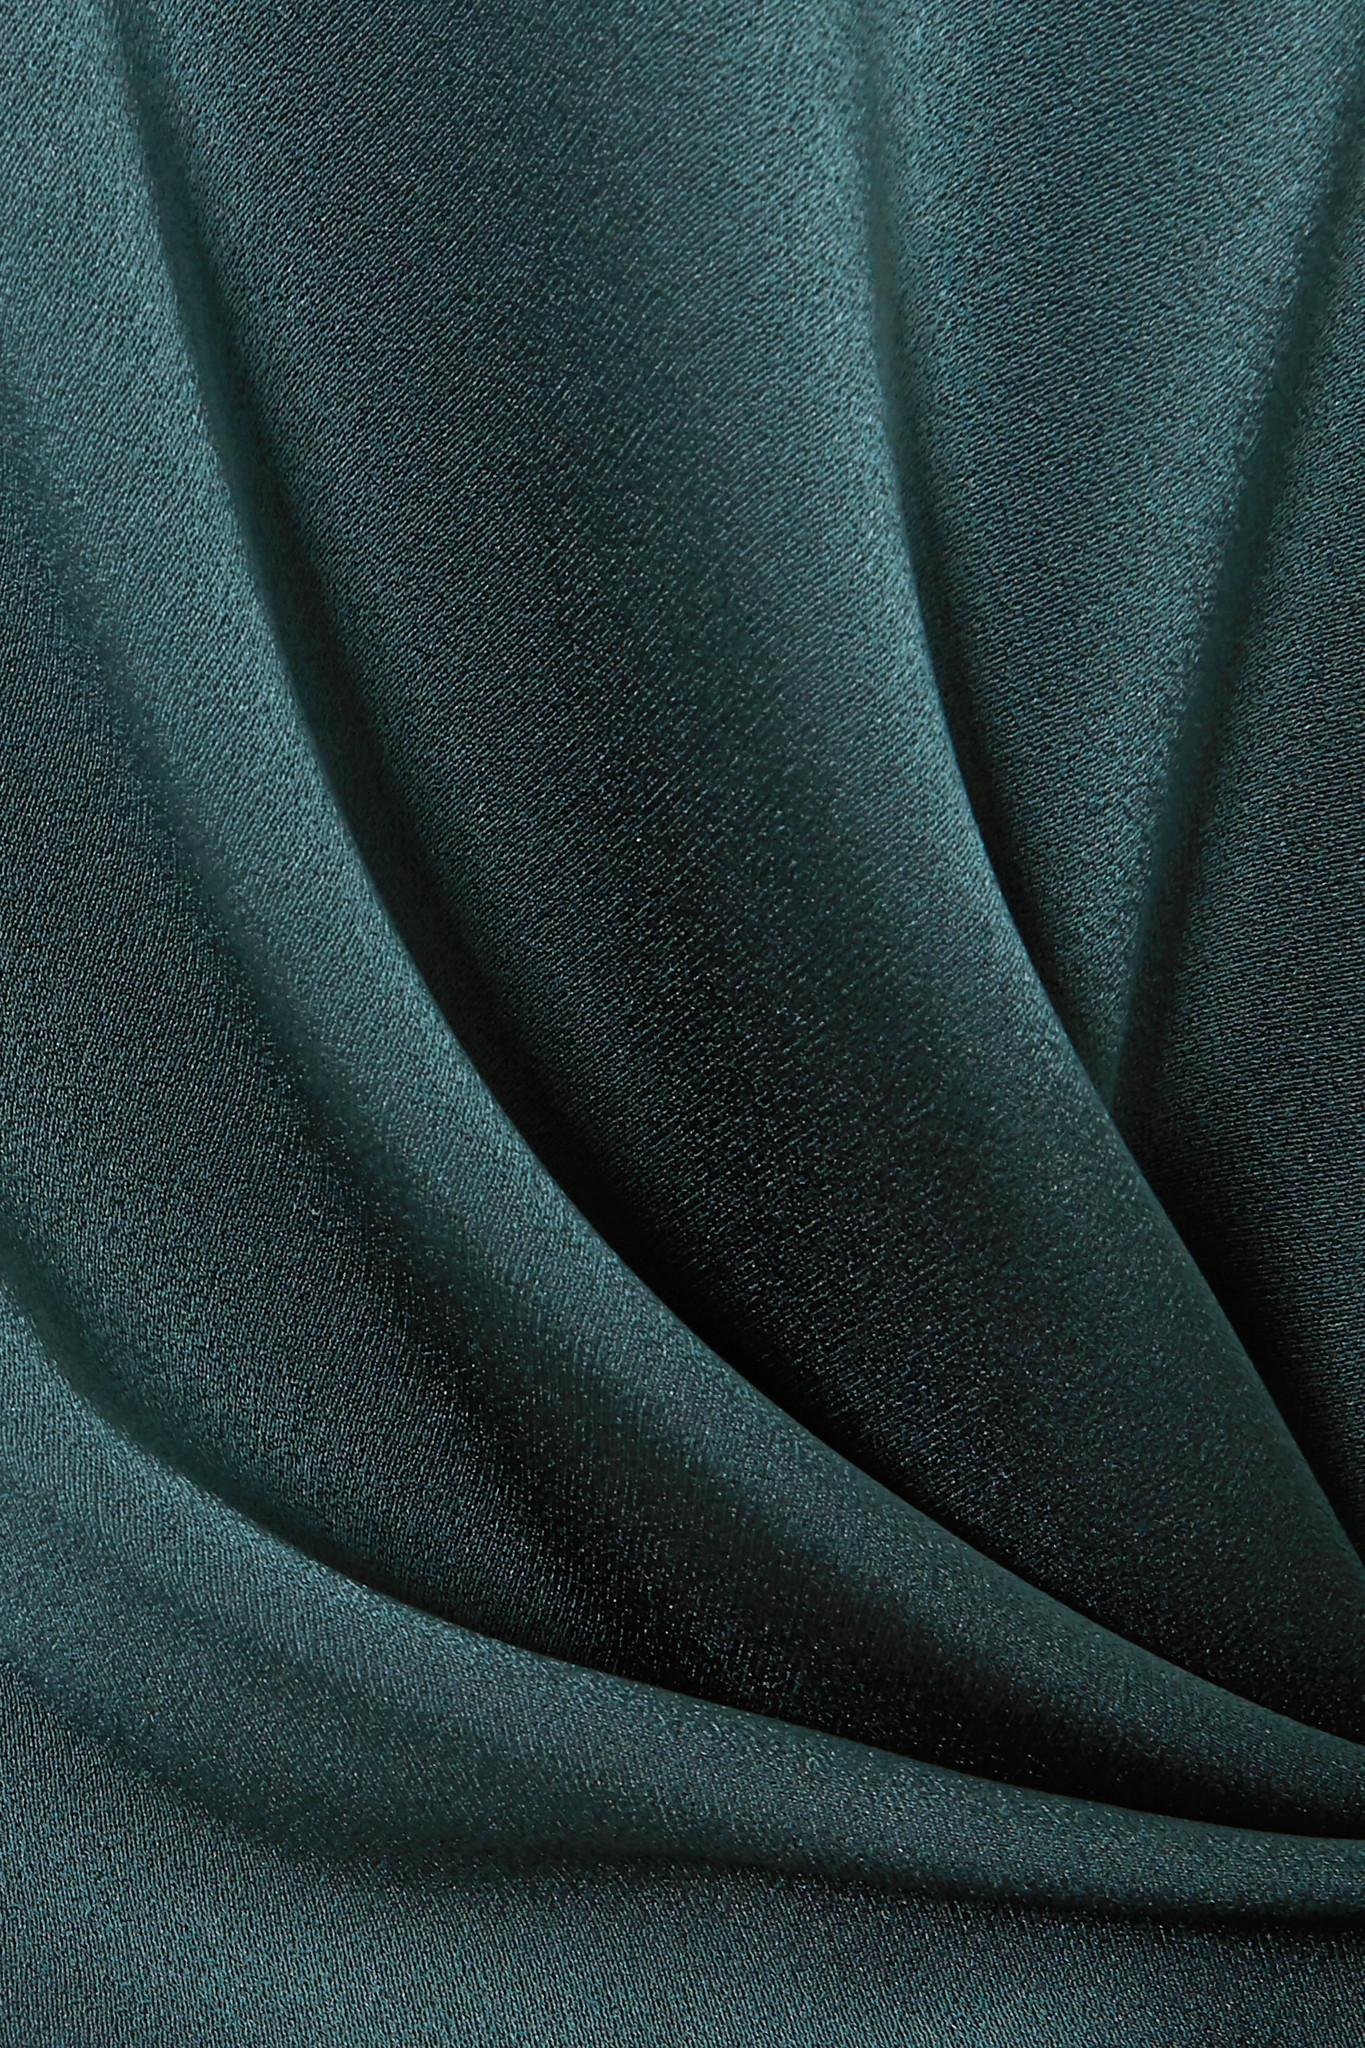 96b64eac6a36 Jason Wu - Multicolor Asymmetric Satin Dress - Lyst. View fullscreen